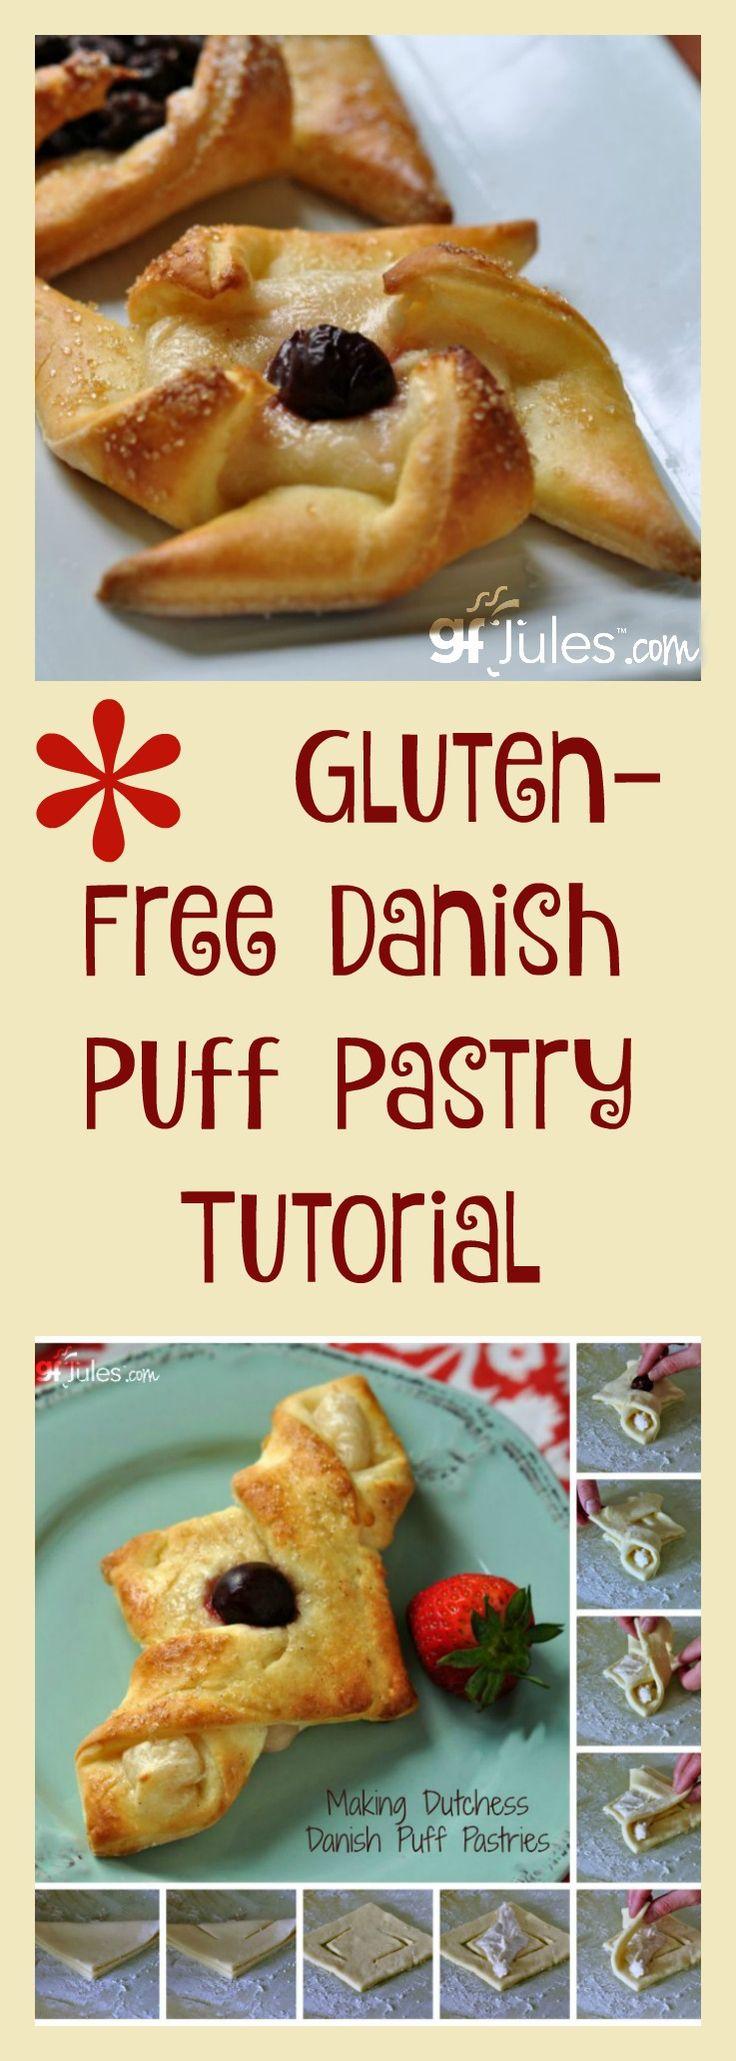 Gluten Free Danish Puff Pastry Tutorial gfJules.com